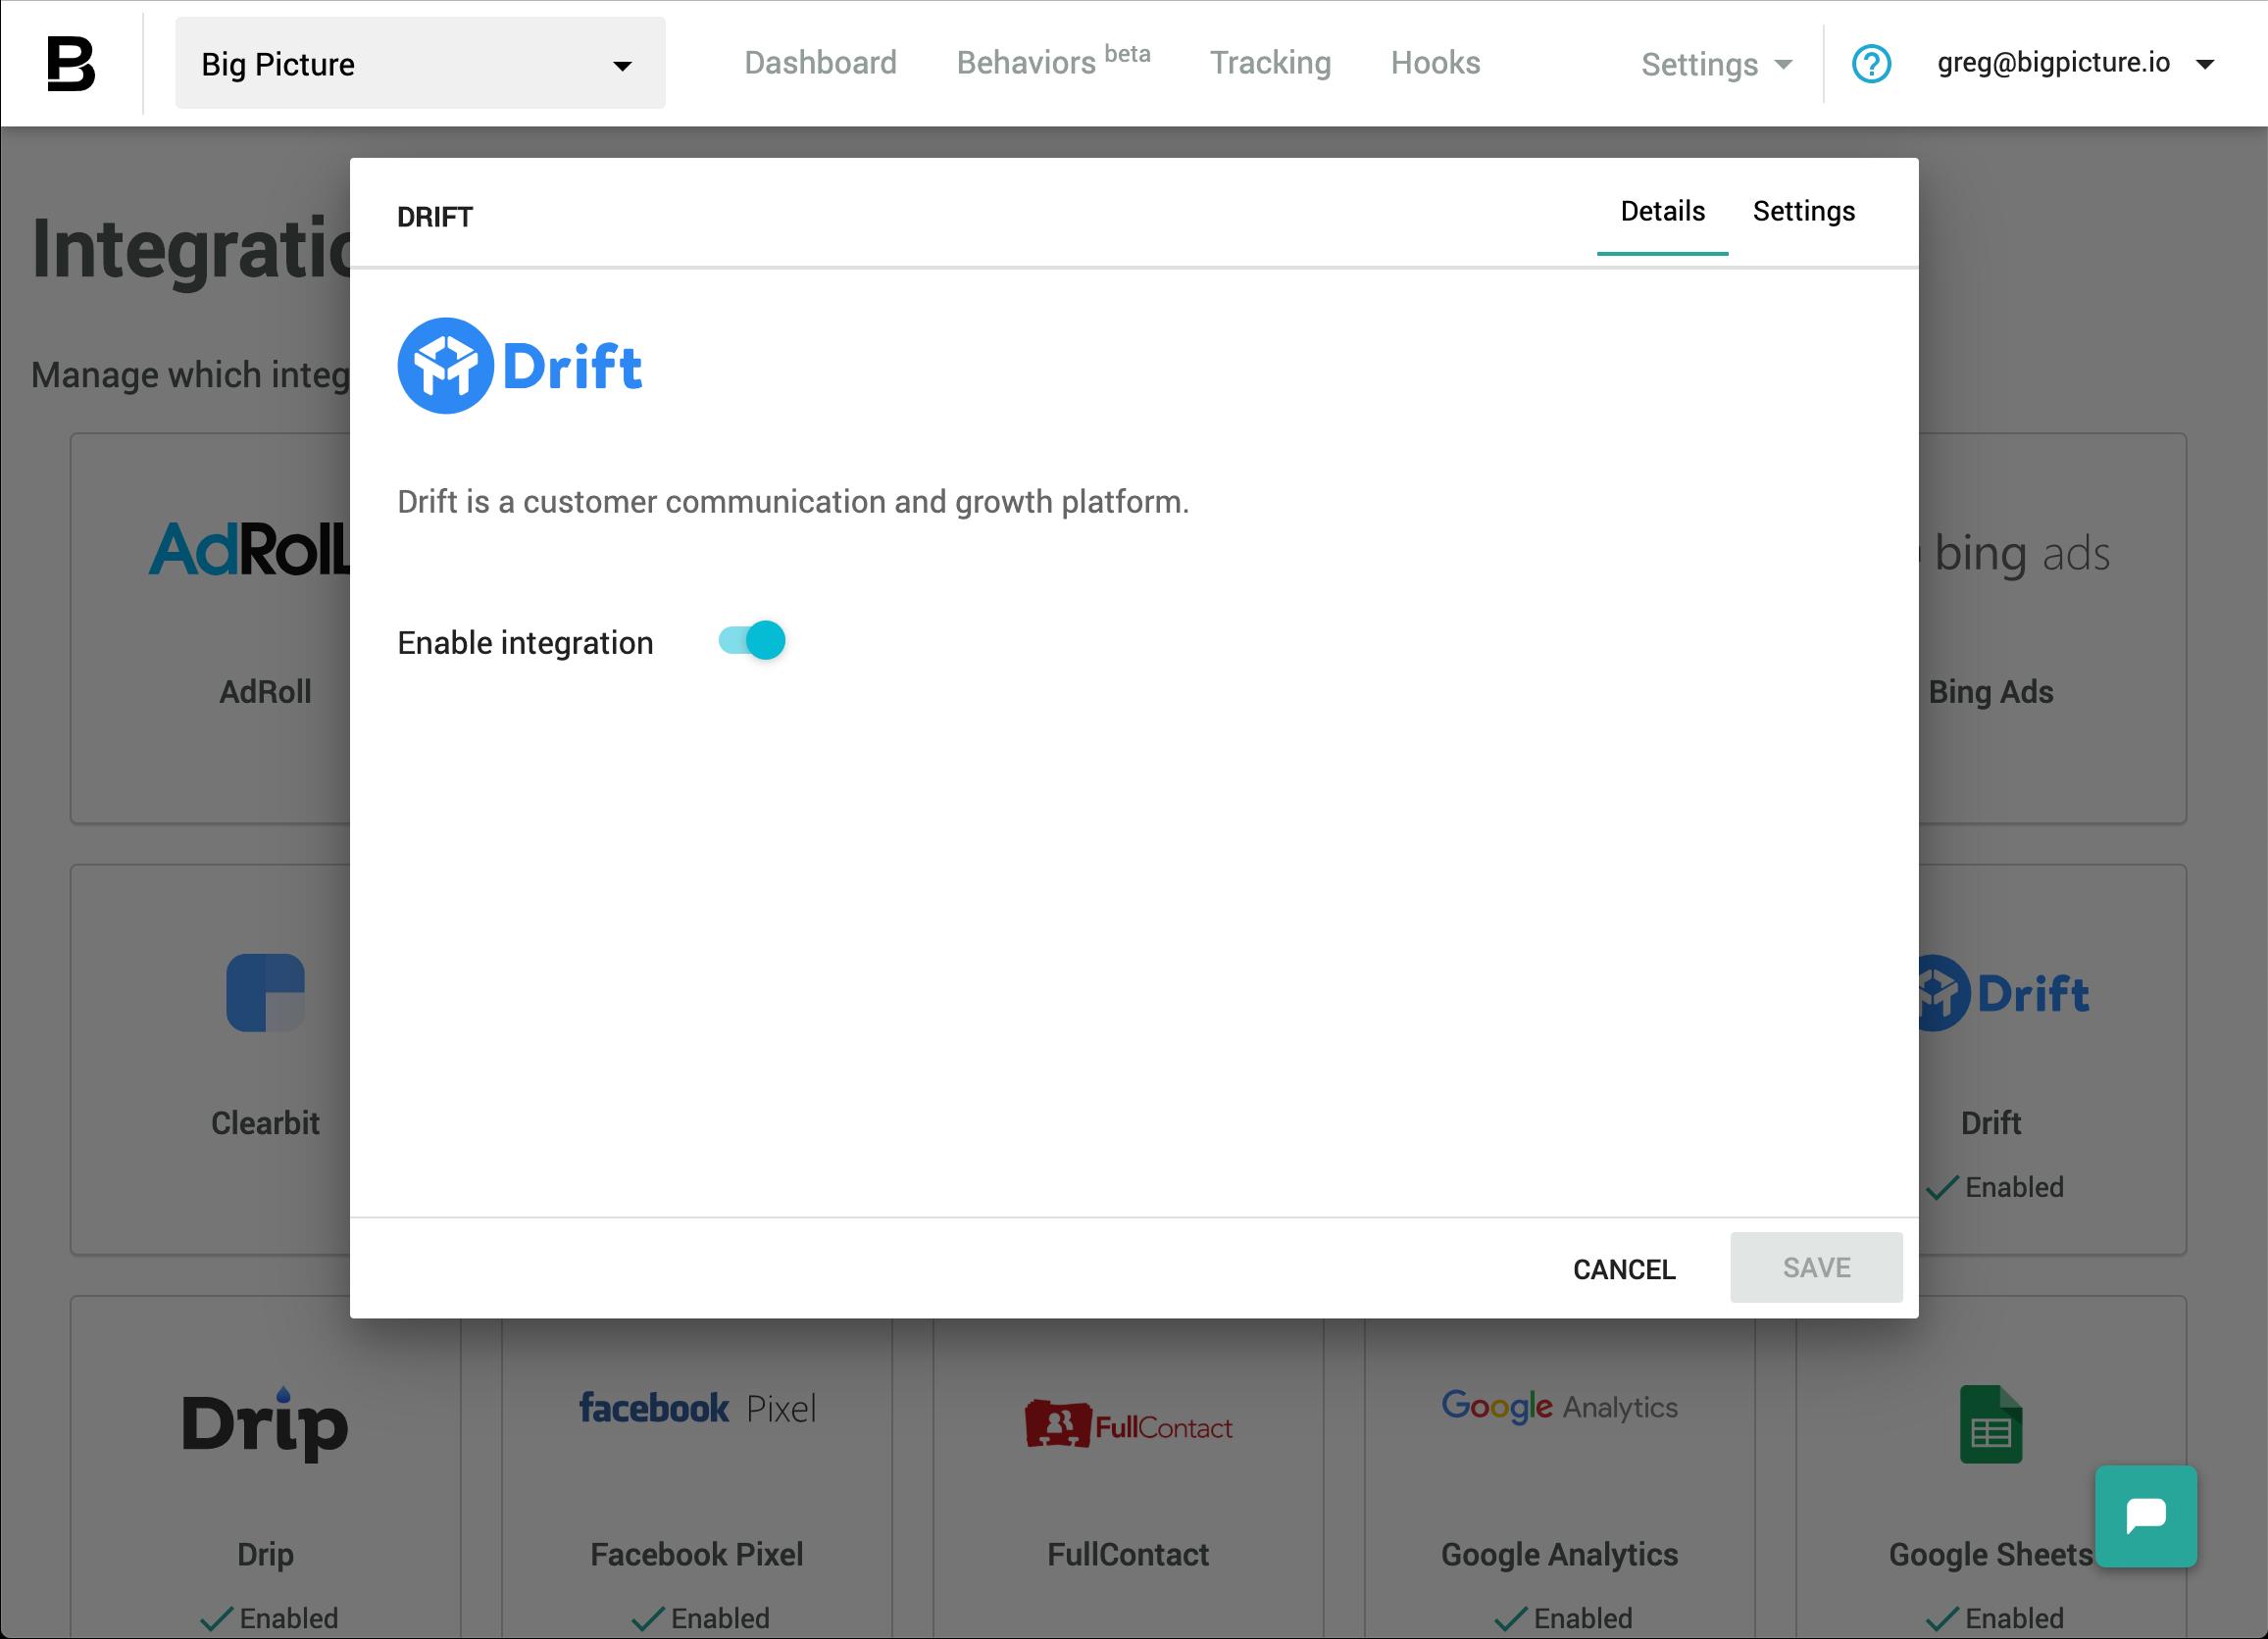 Drift settings - enabled